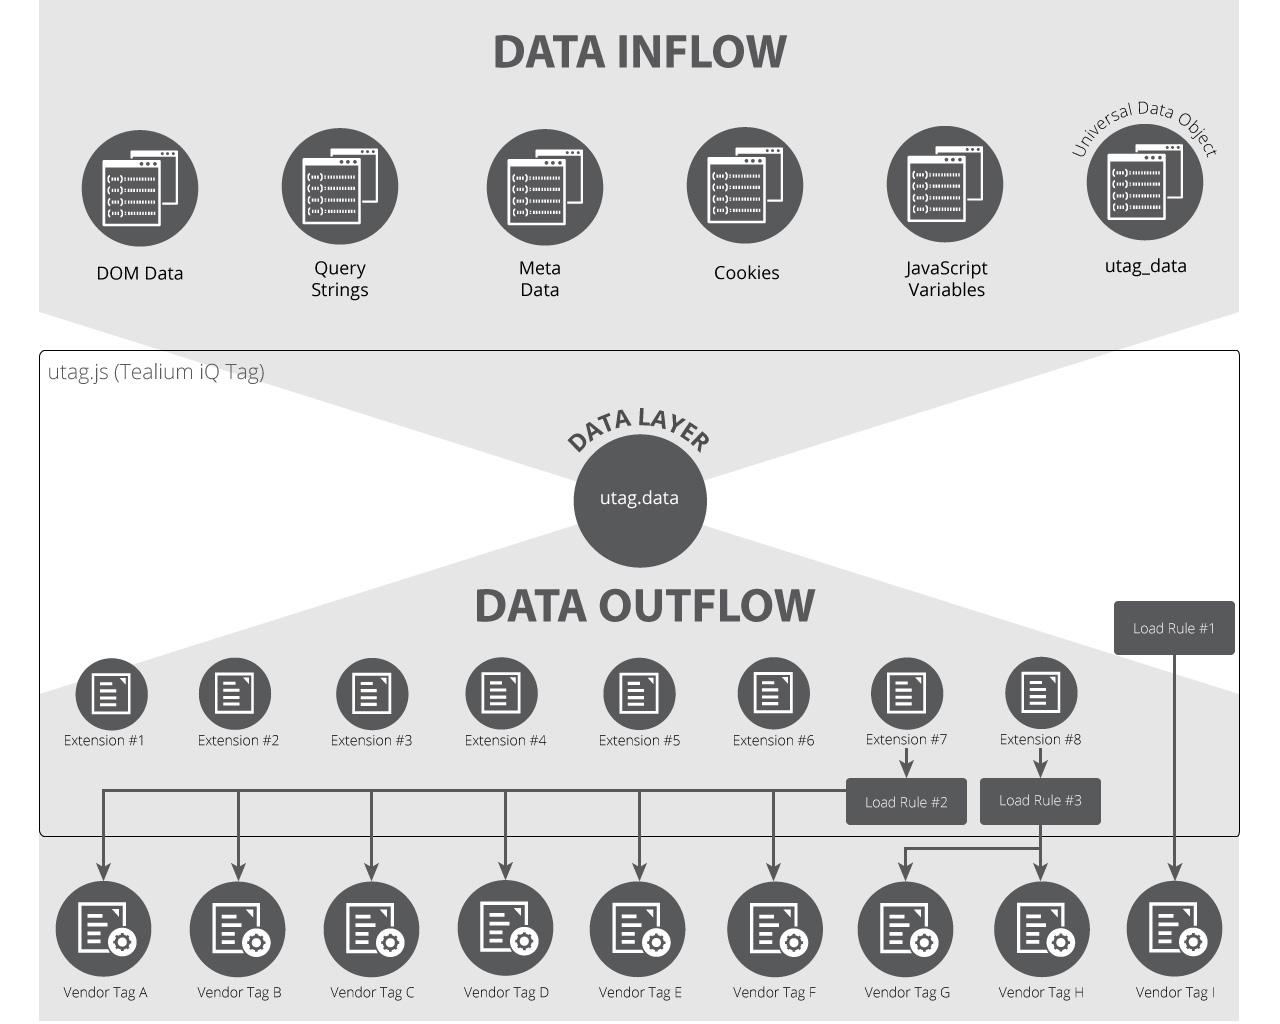 dataflow_b&w.jpeg